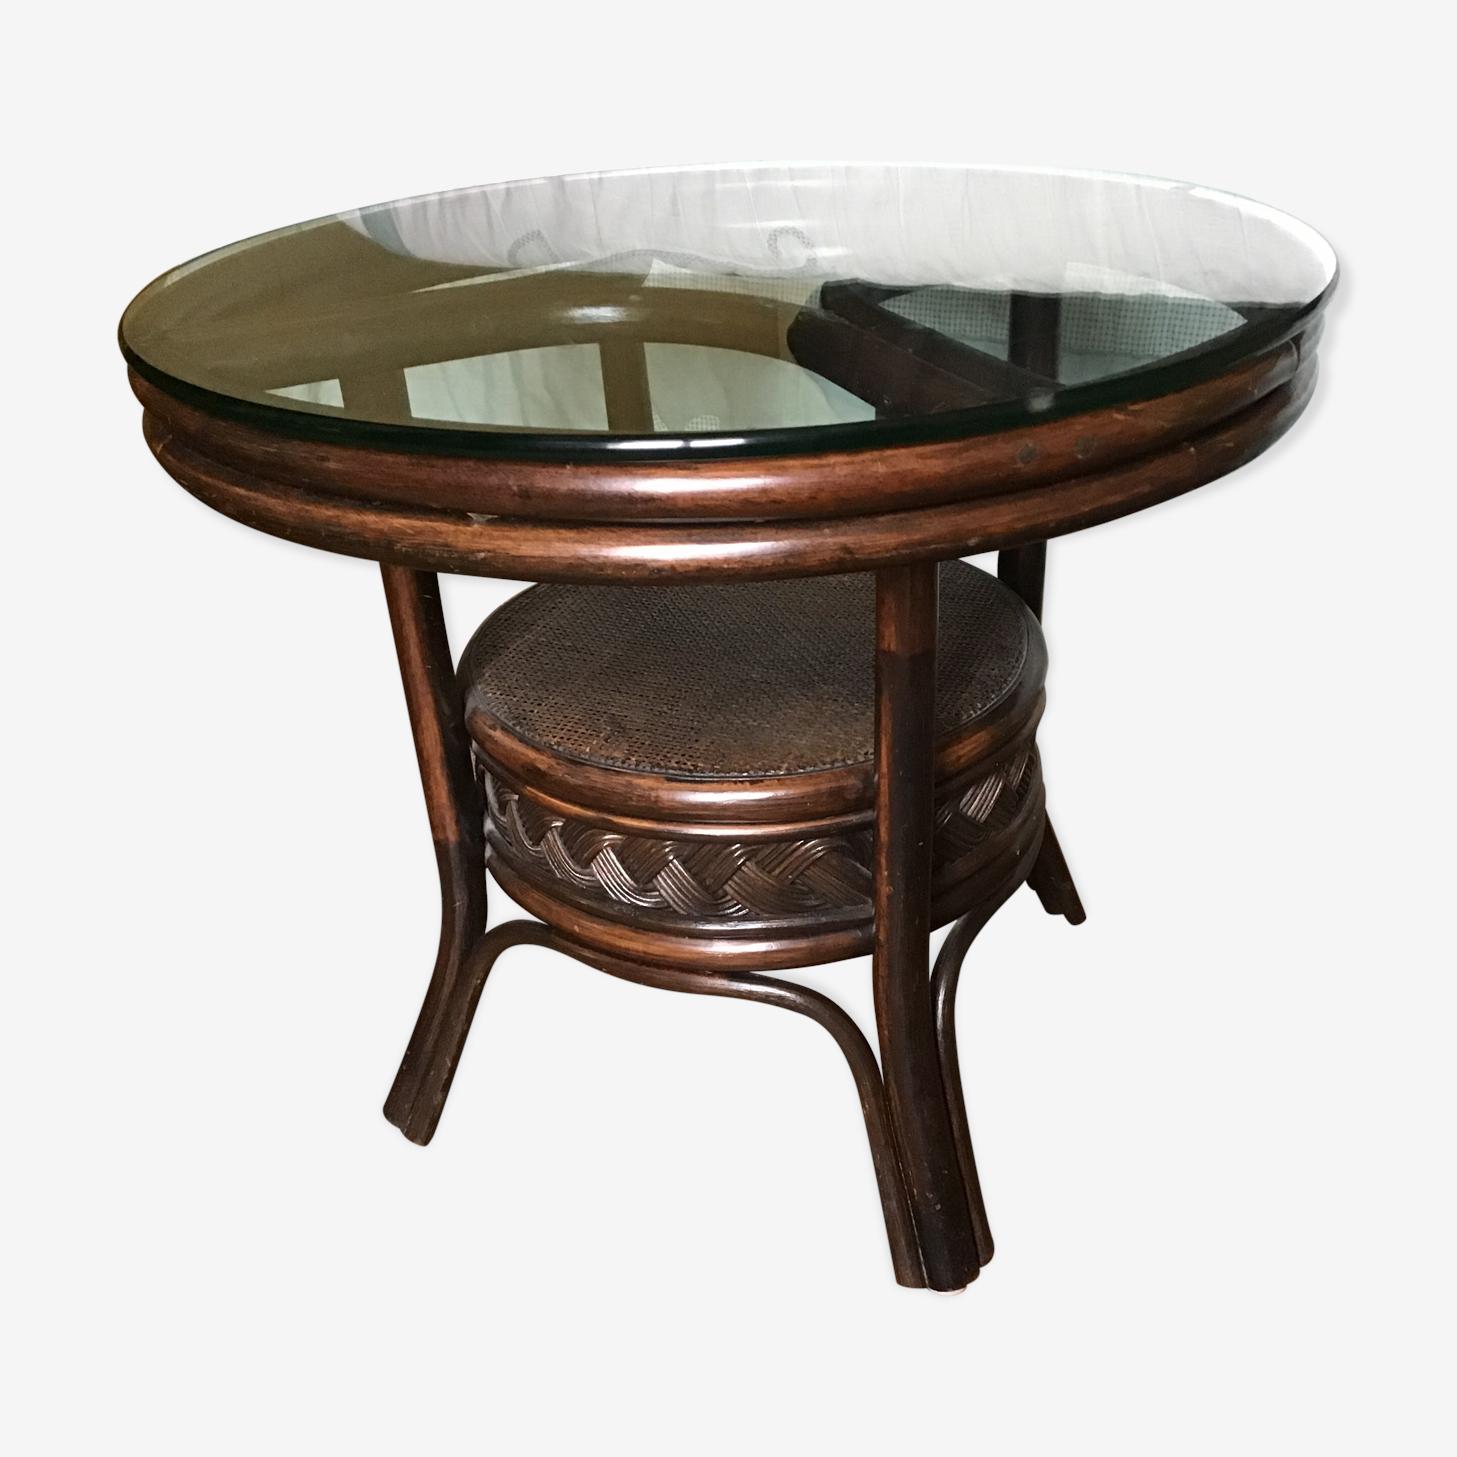 Table basse bambou et rotin